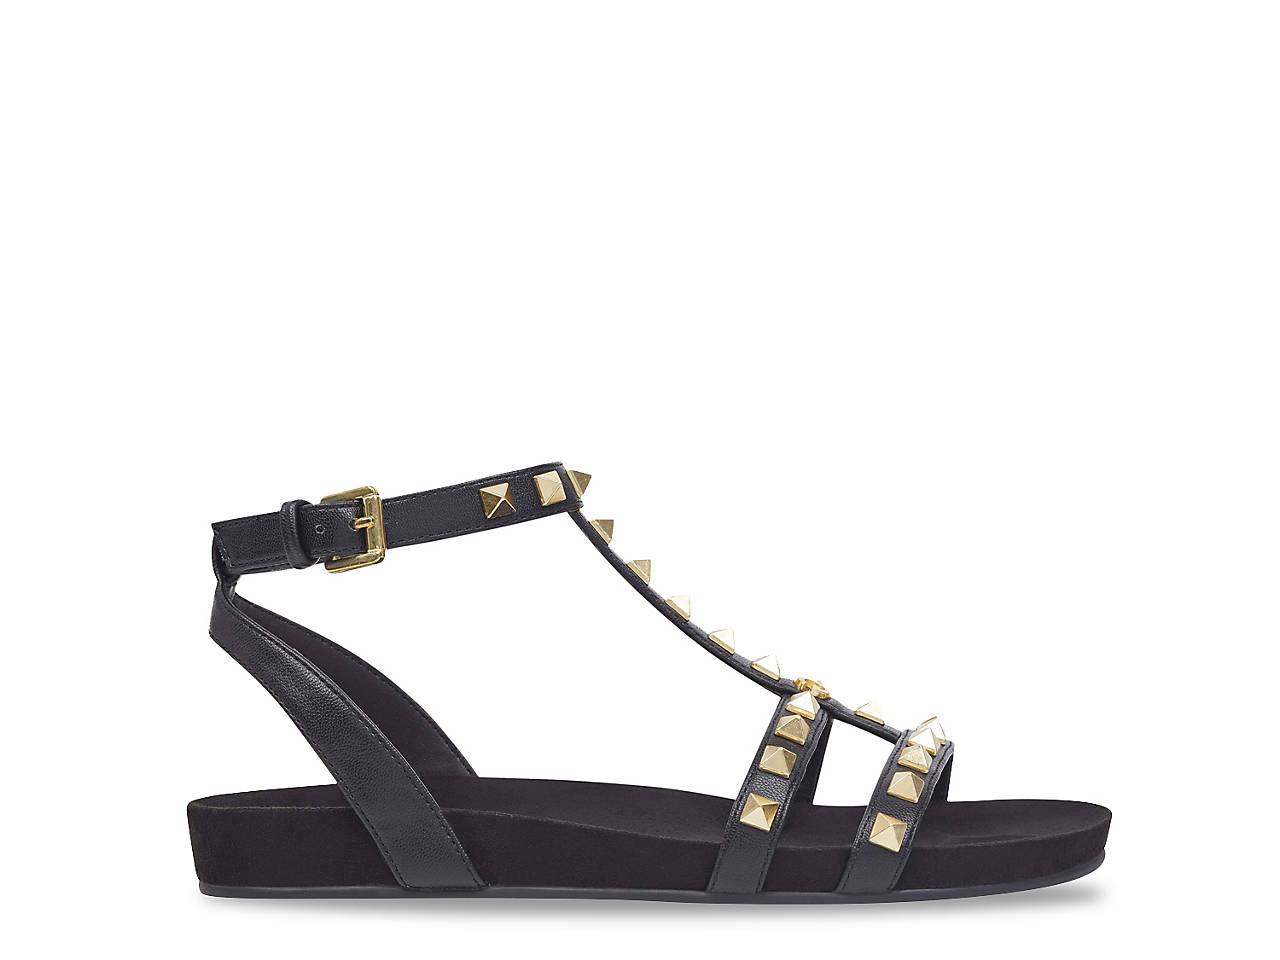 c0b4a3075194 G by GUESS Sherri Gladiator Sandal Women s Shoes